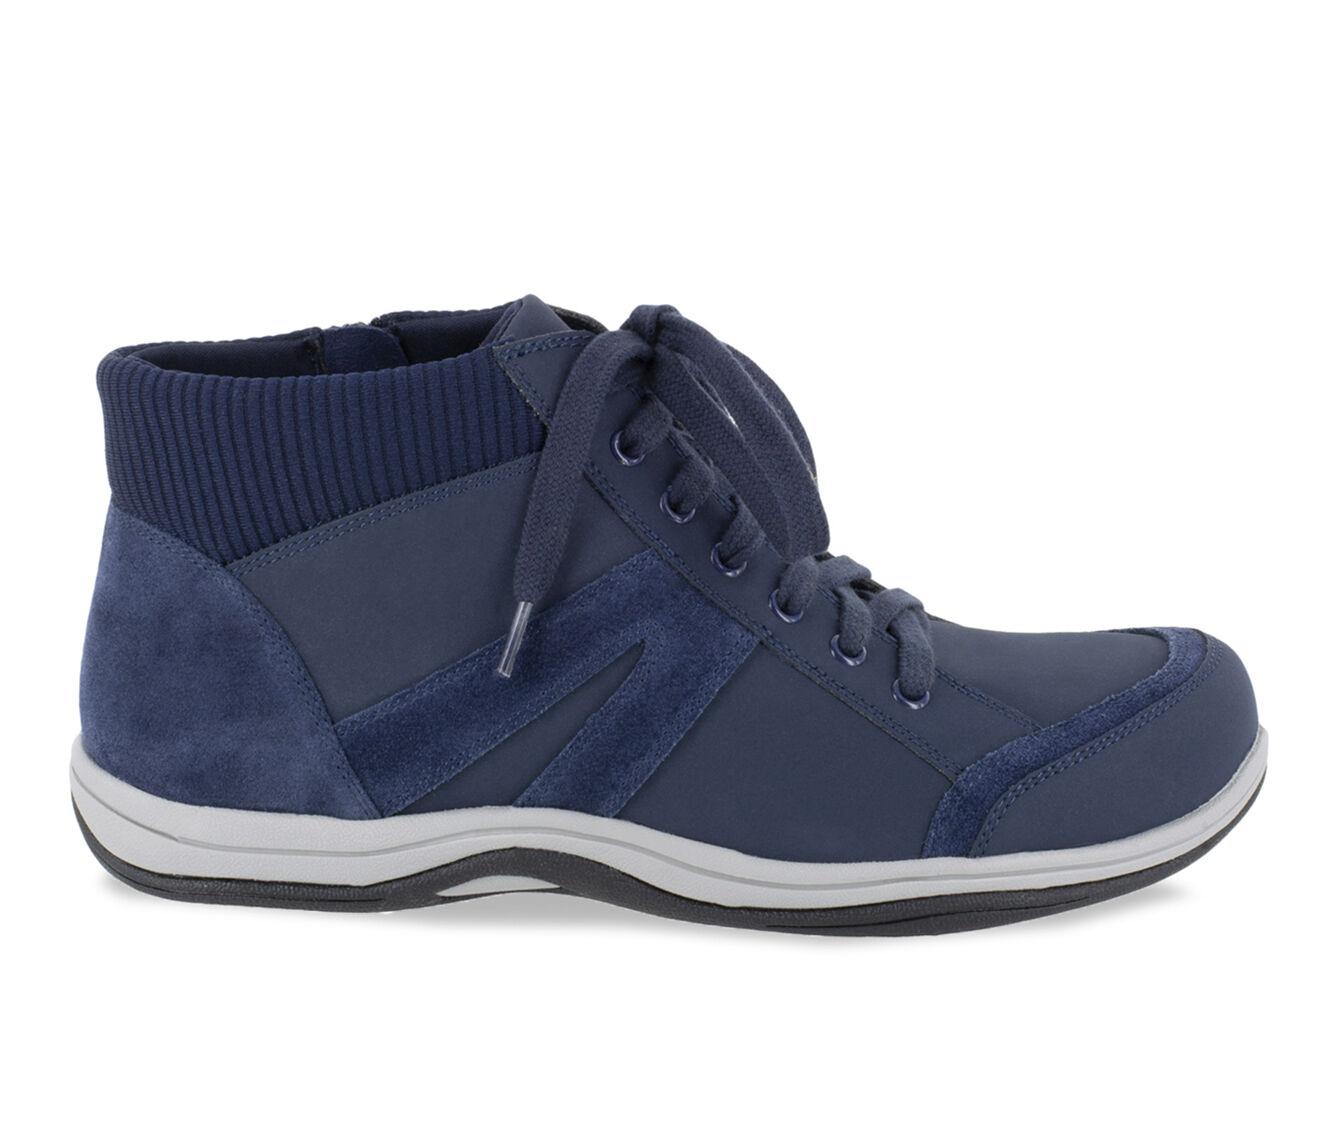 uk shoes_kd4892